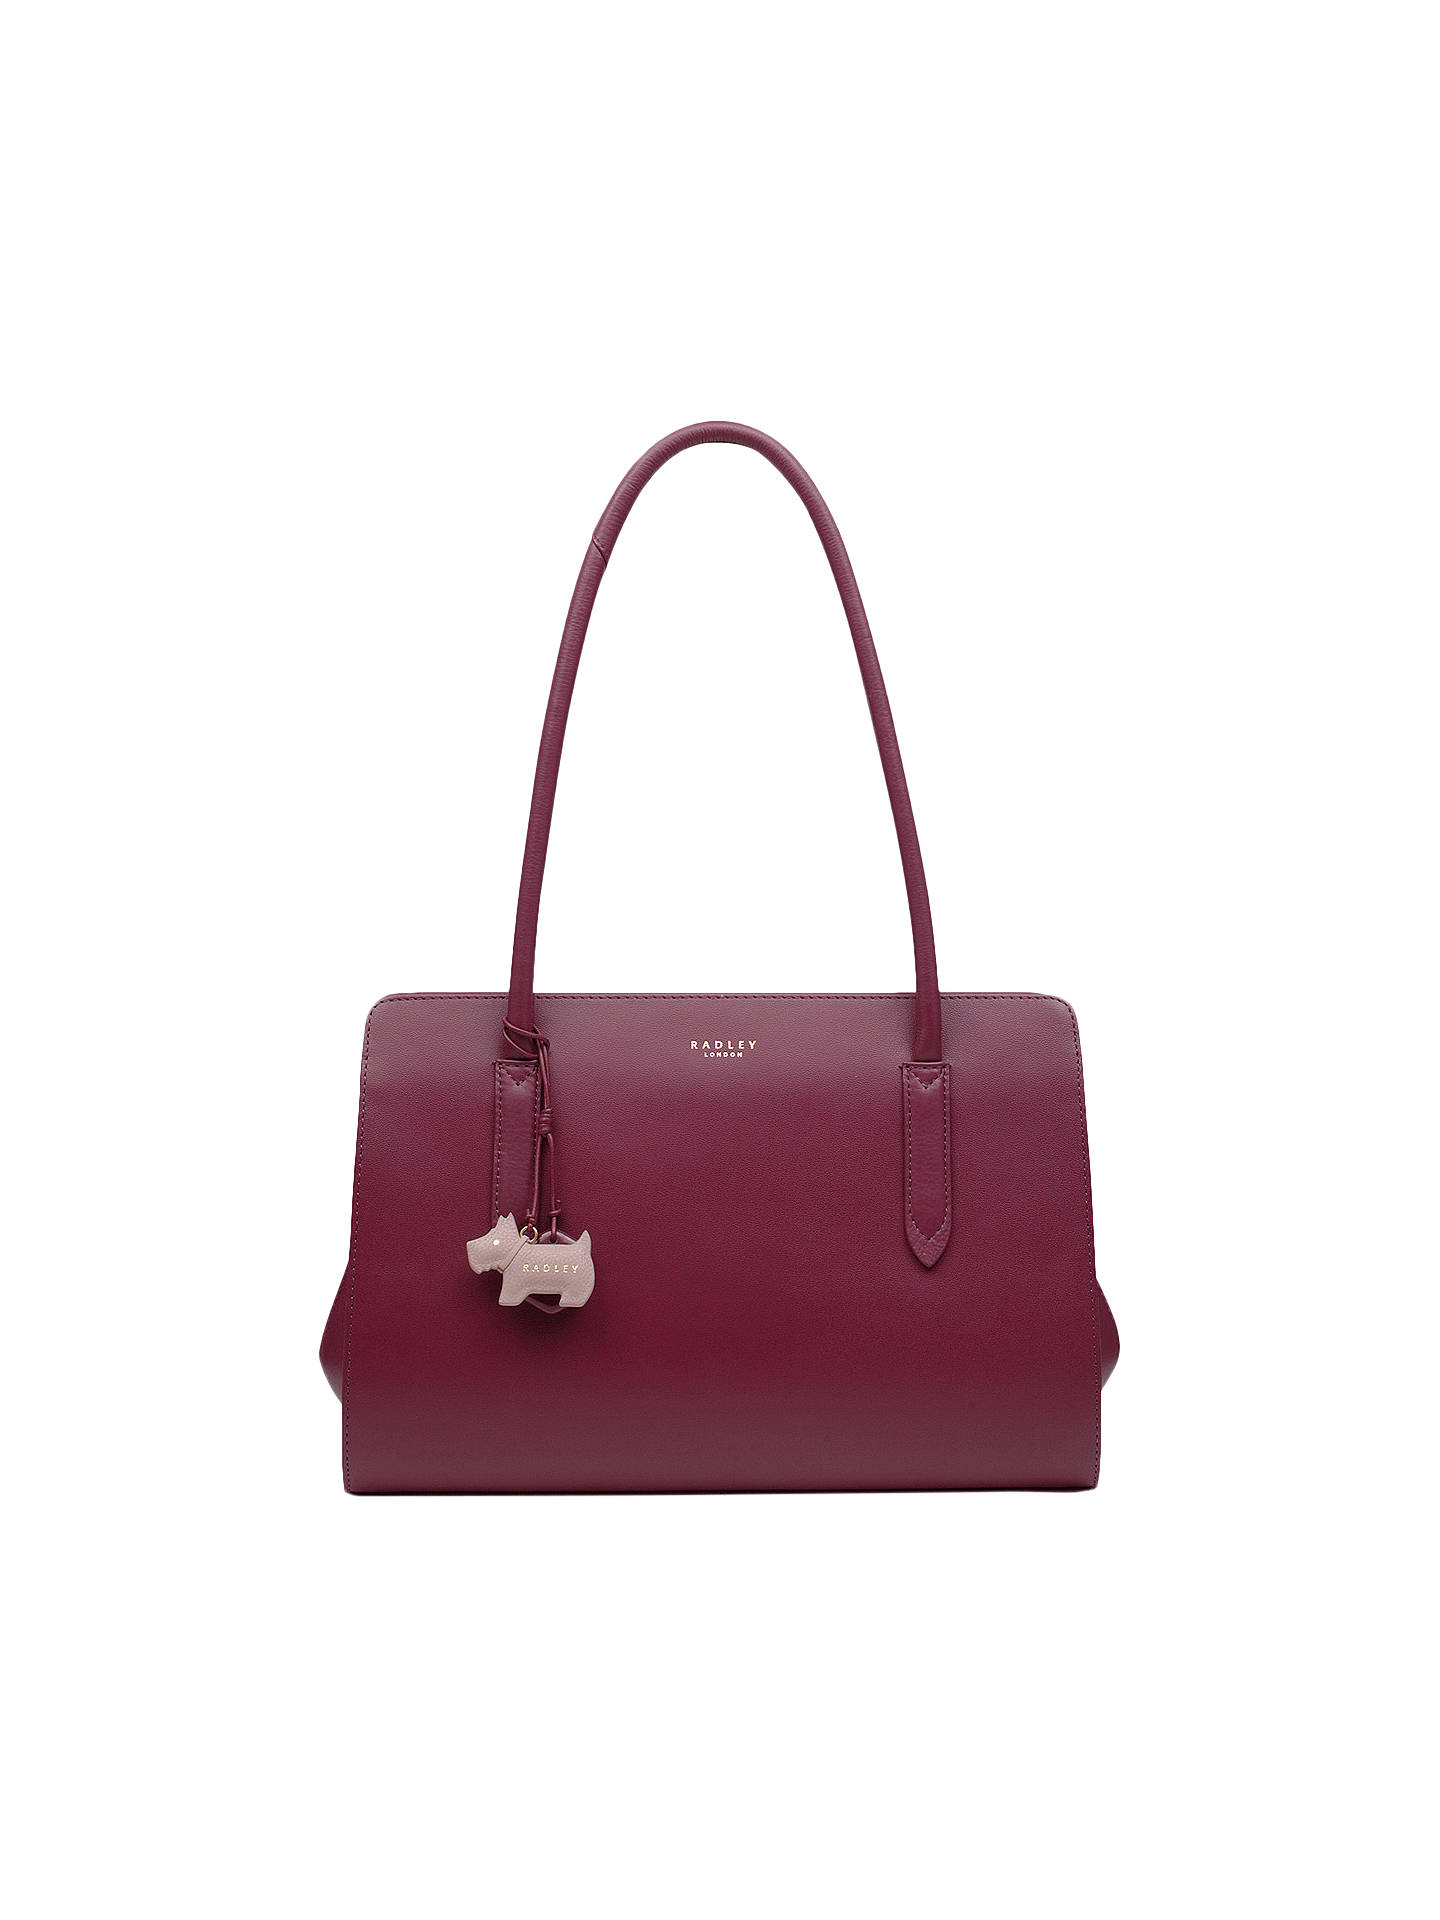 Radley Liverpool Street Leather Medium Tote Bag Berry Online At Johnlewis